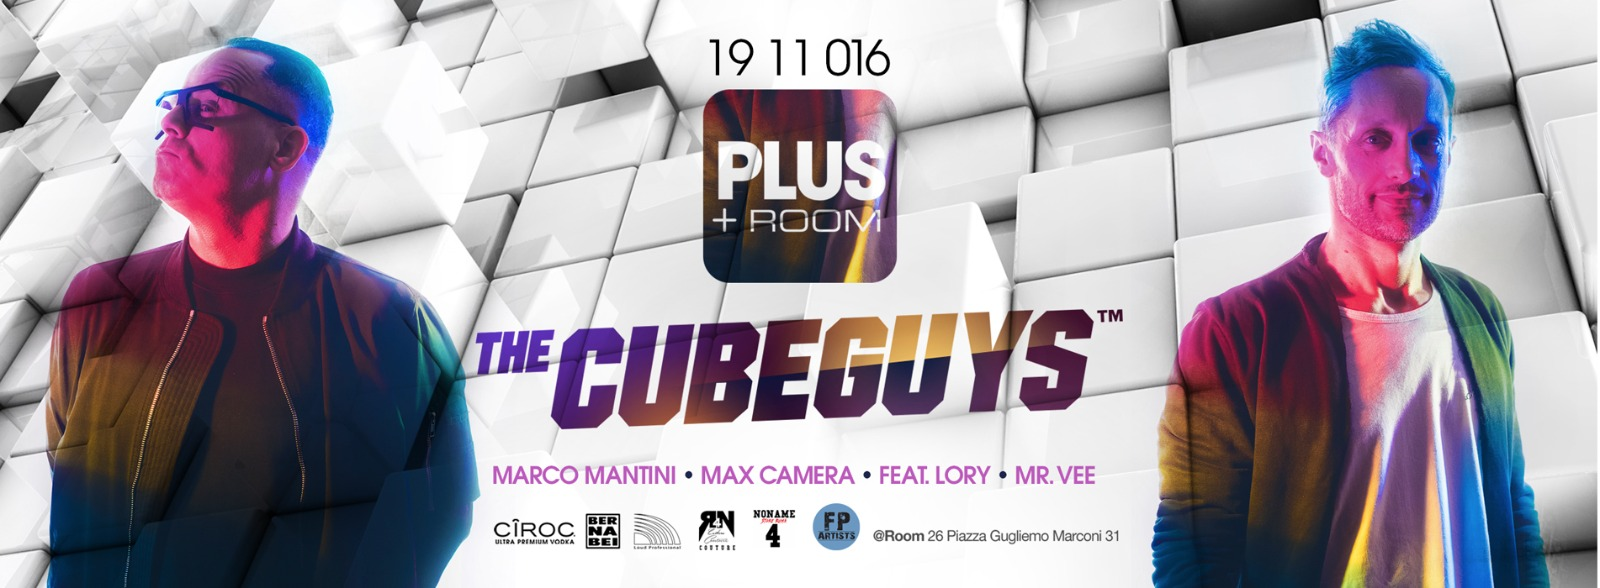 The Cube Guys nella discoteca Room 26 Roma sabato 19 11 2016